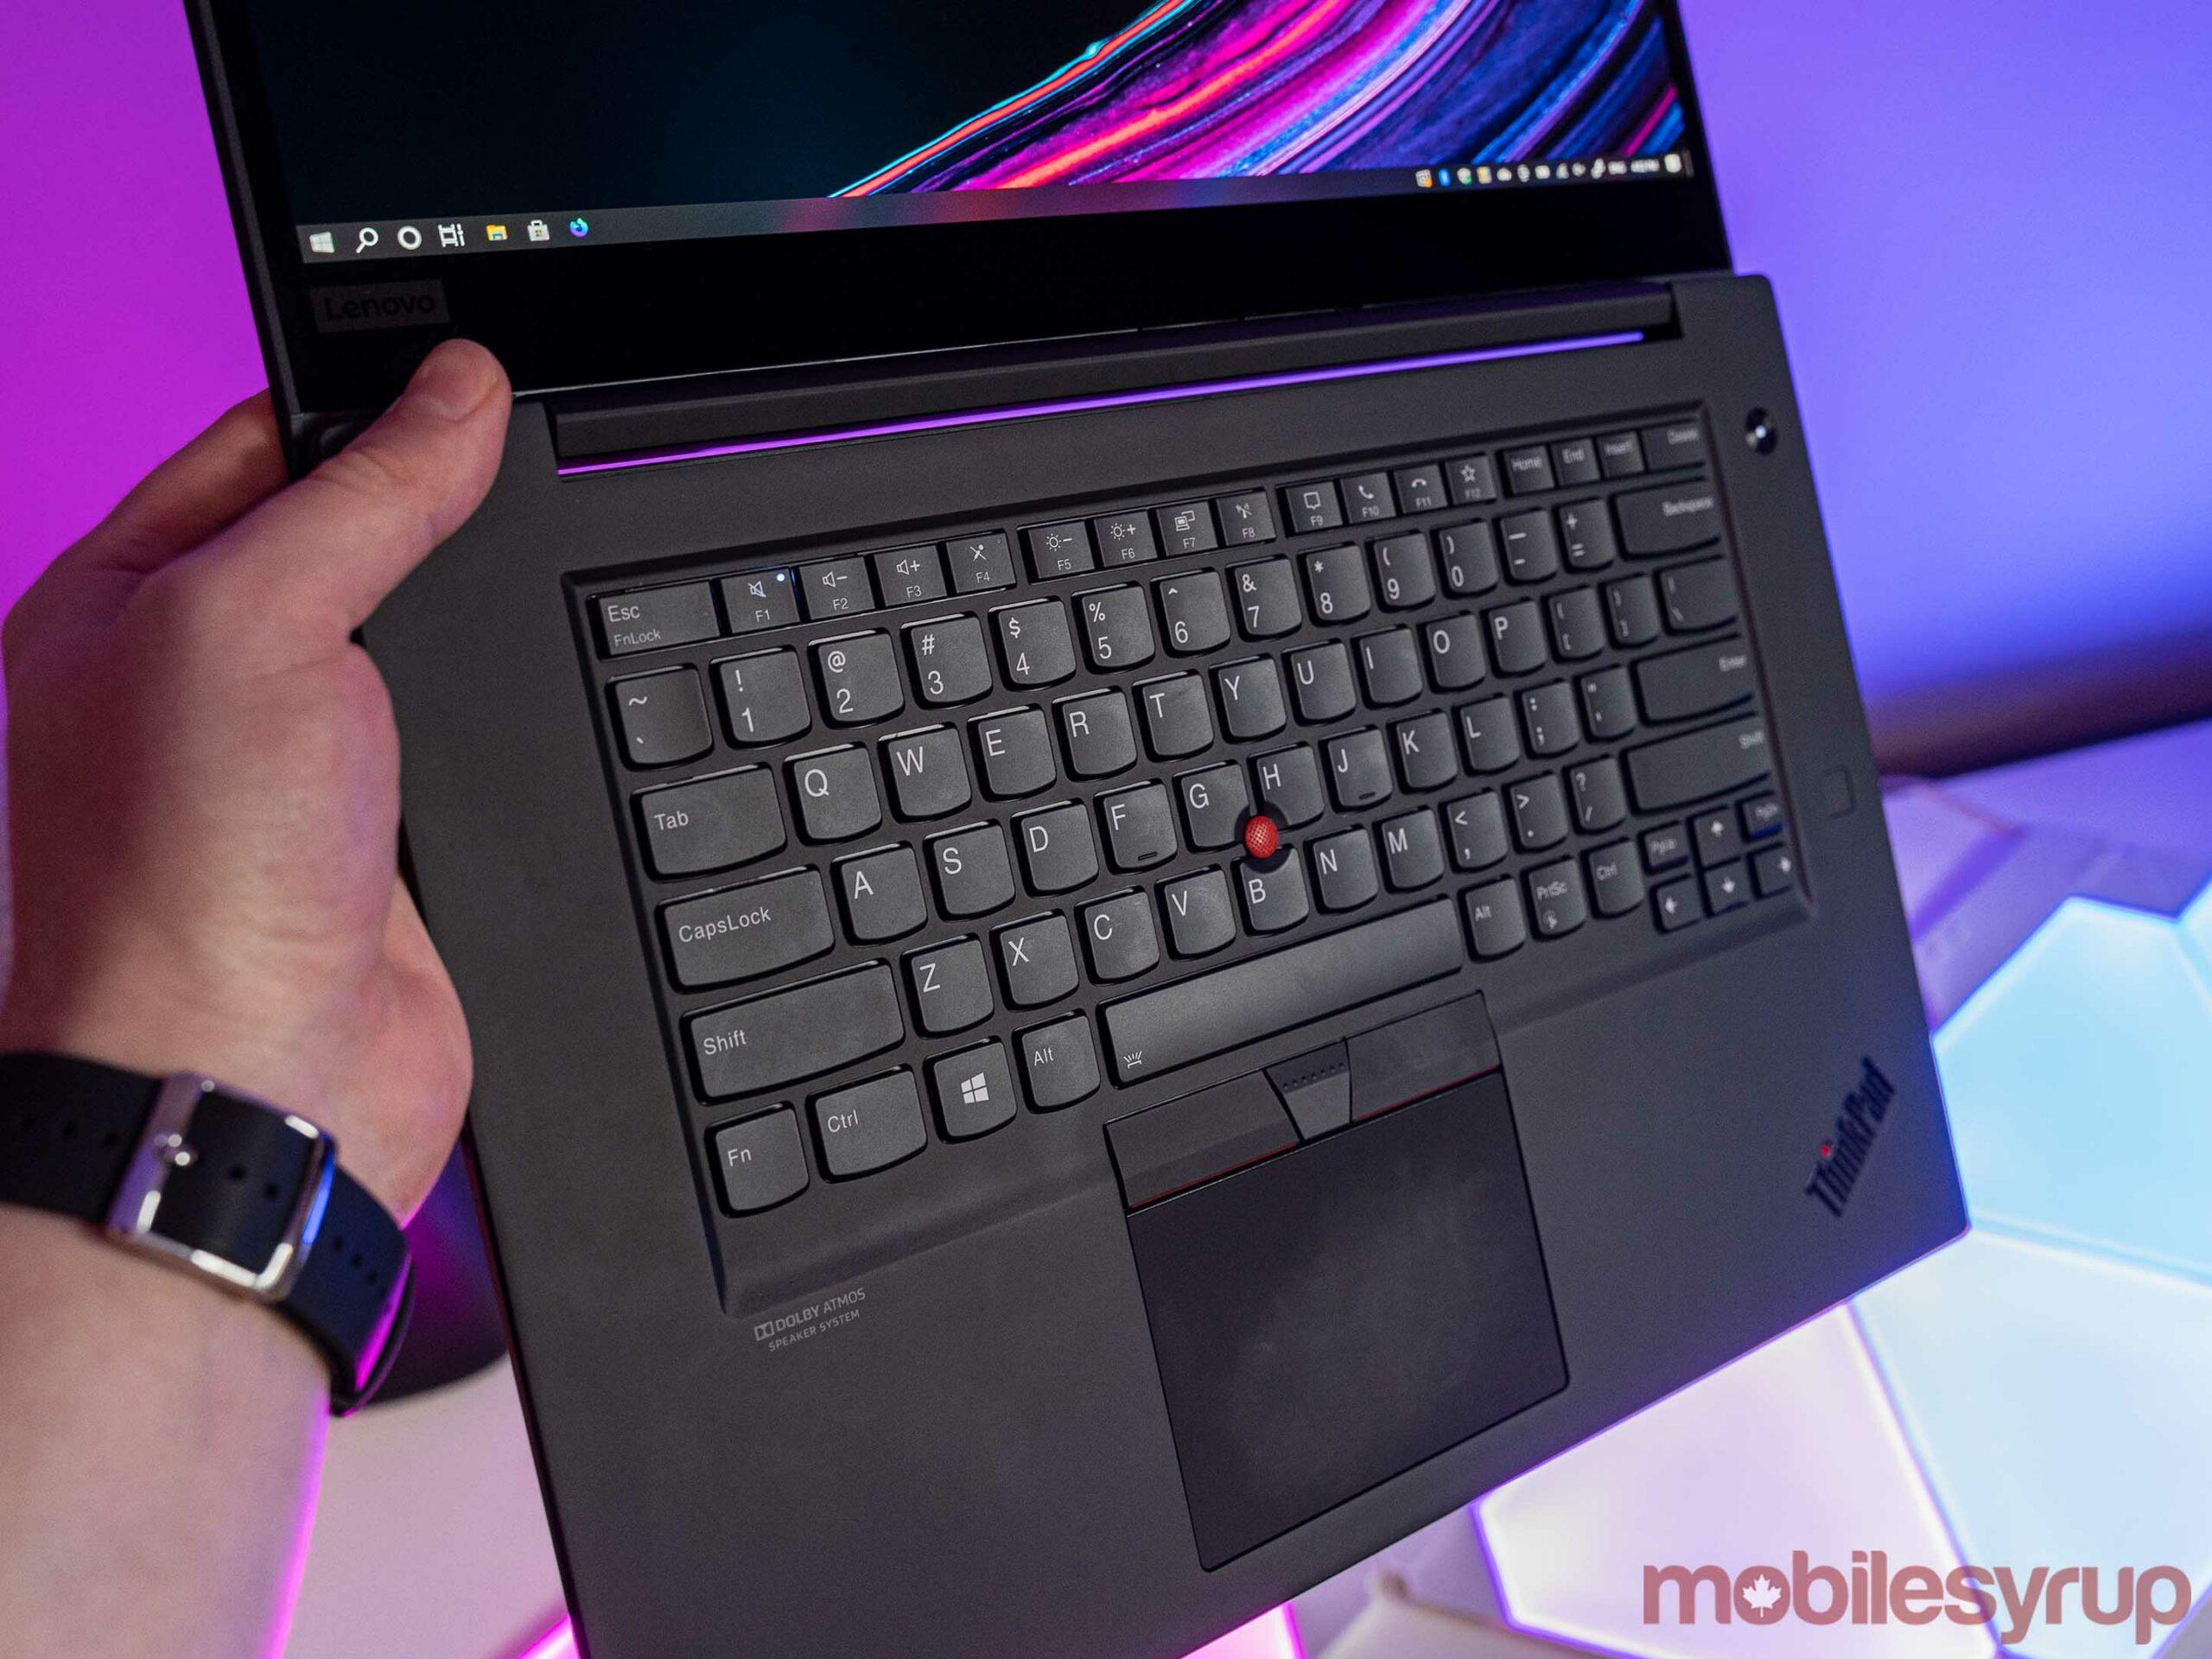 ThinkPad X1 Extreme keyboard